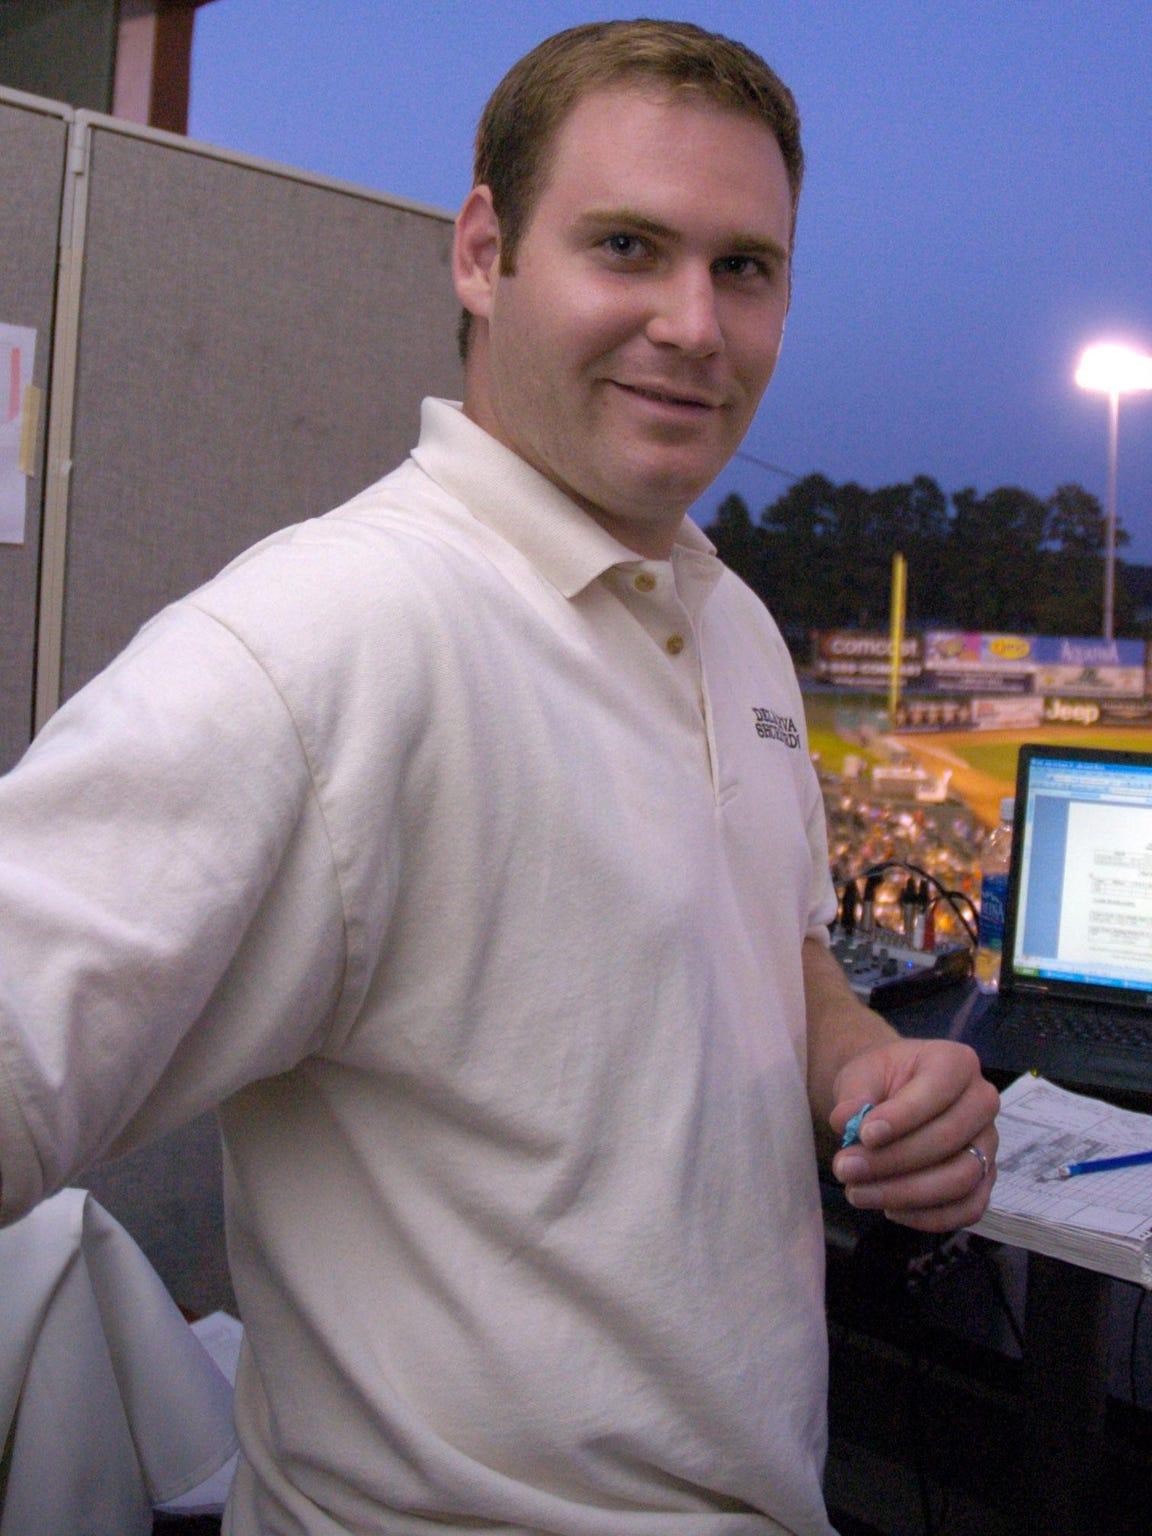 Randy Scott has been to Arthur W. Perdue Stadium as